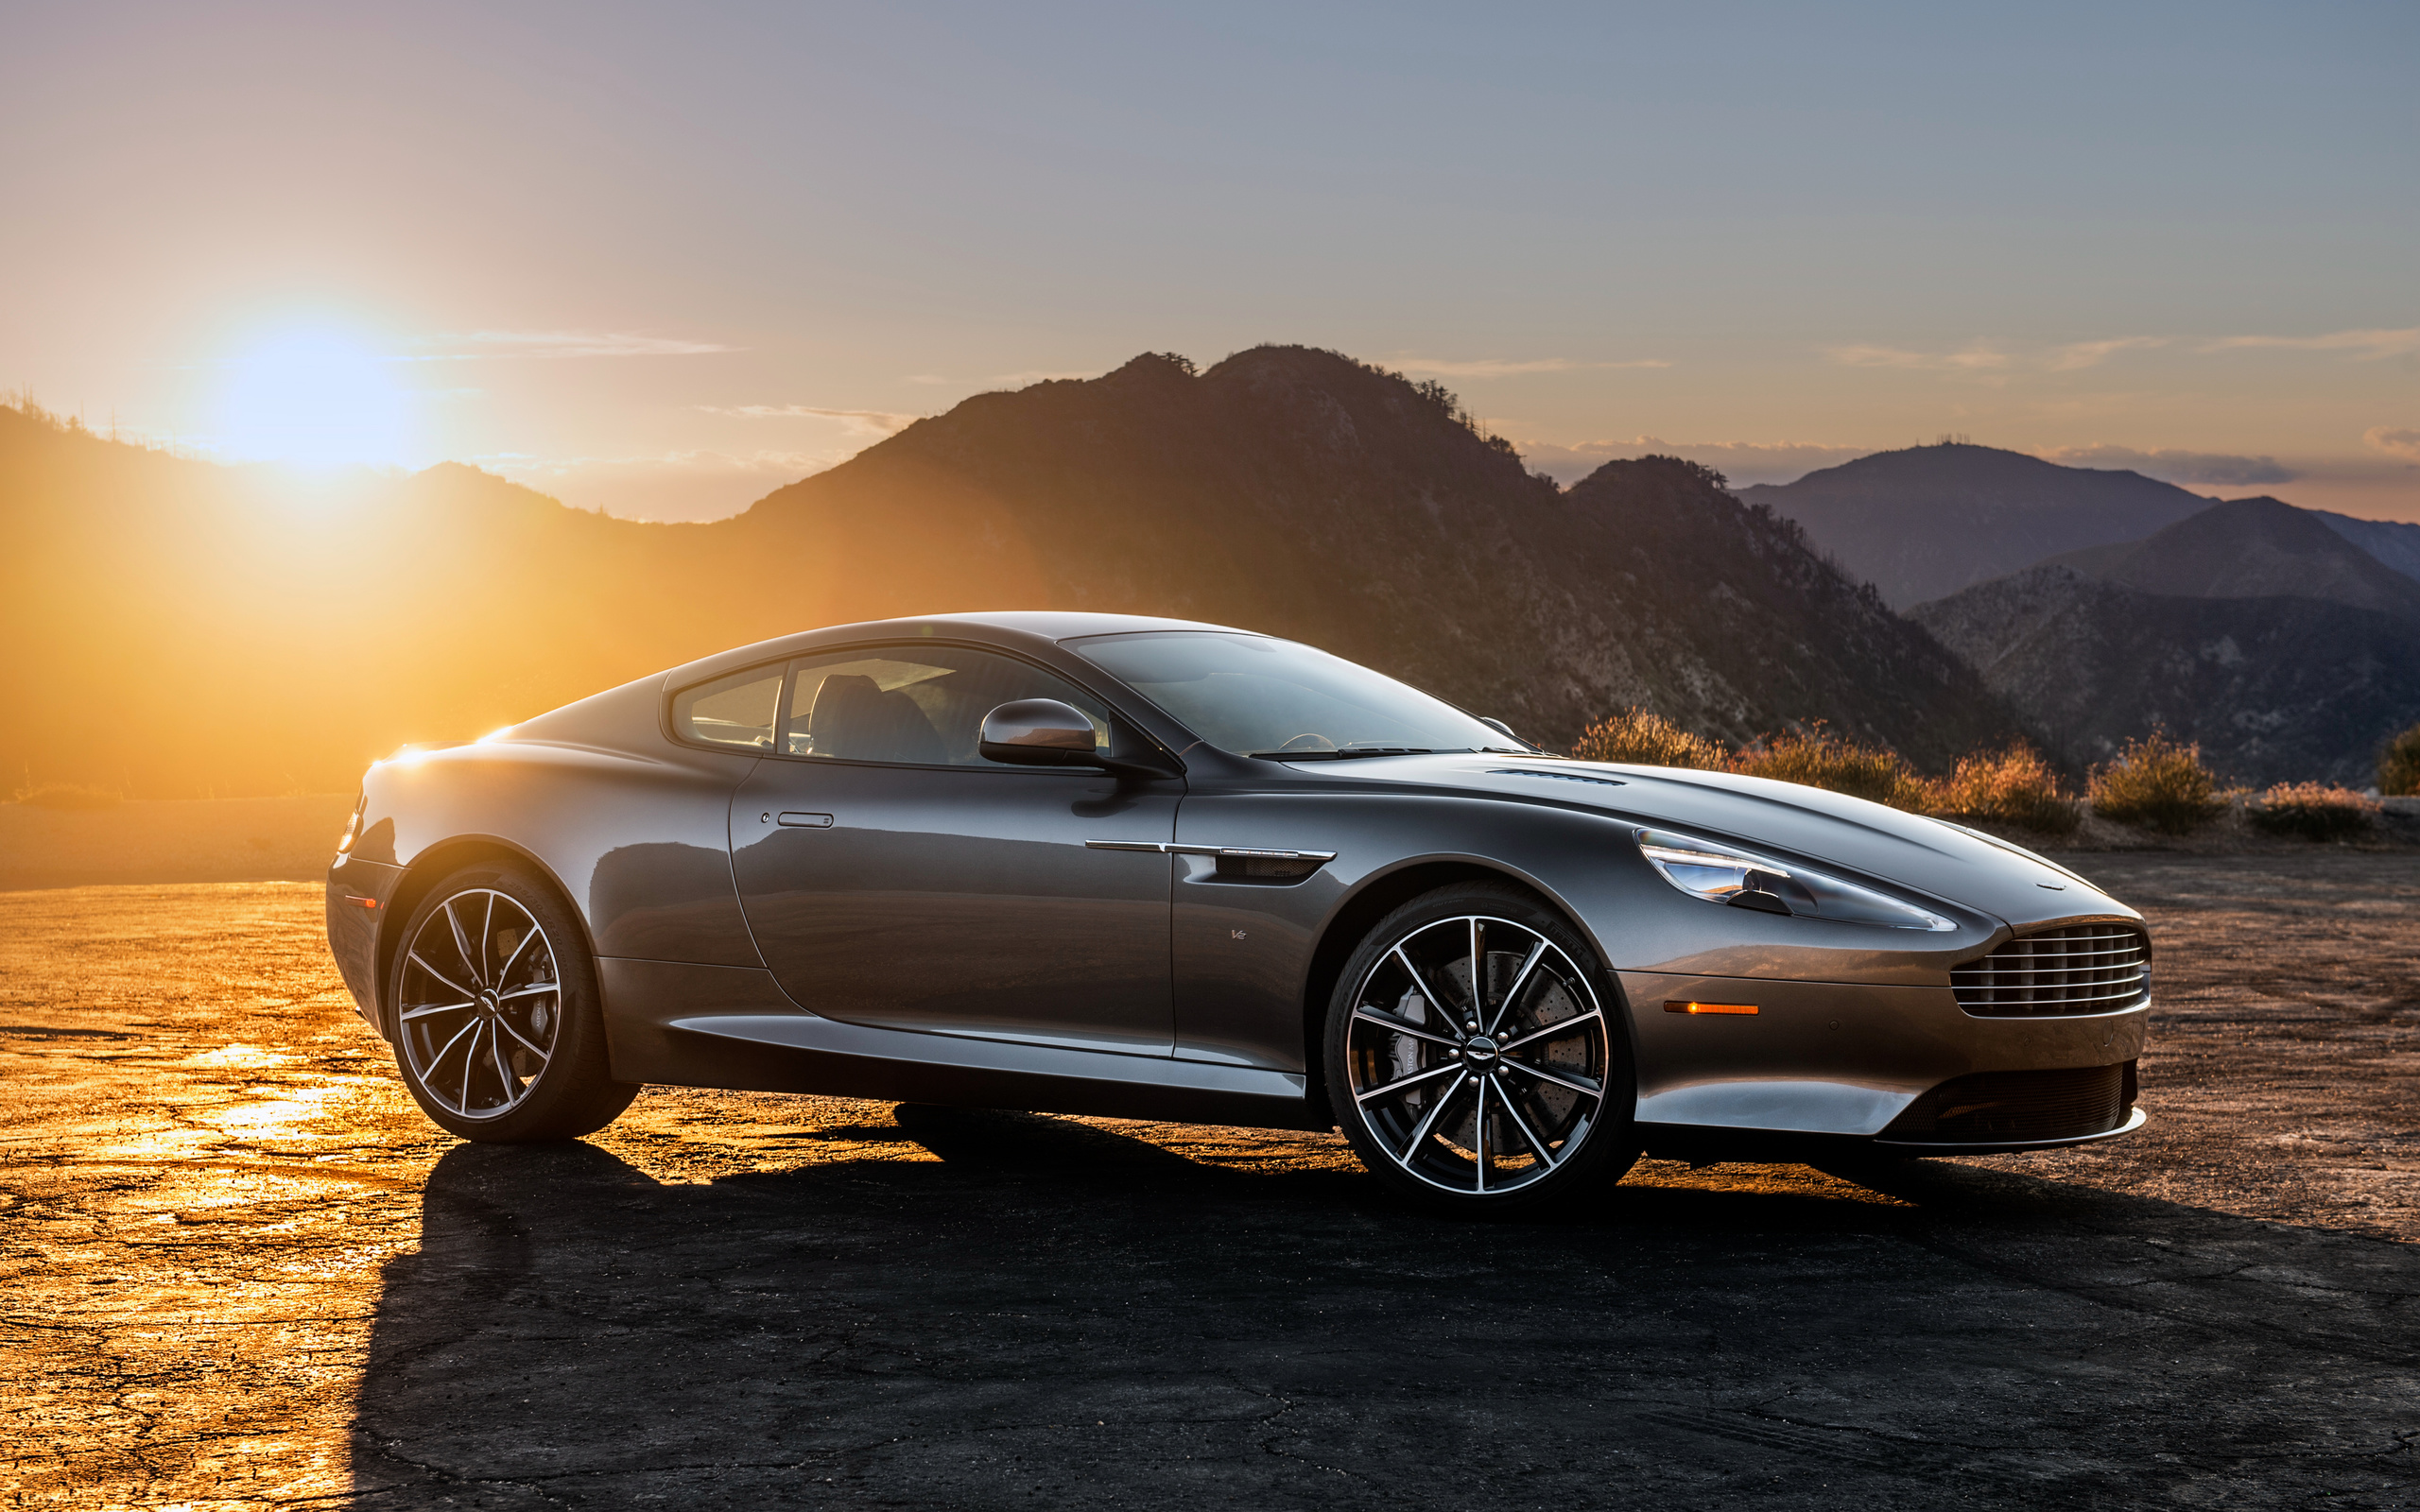 Aston Martin DB9 at sunset 4K Ultra HD wallpaper 4k WallpaperNet 2560x1600